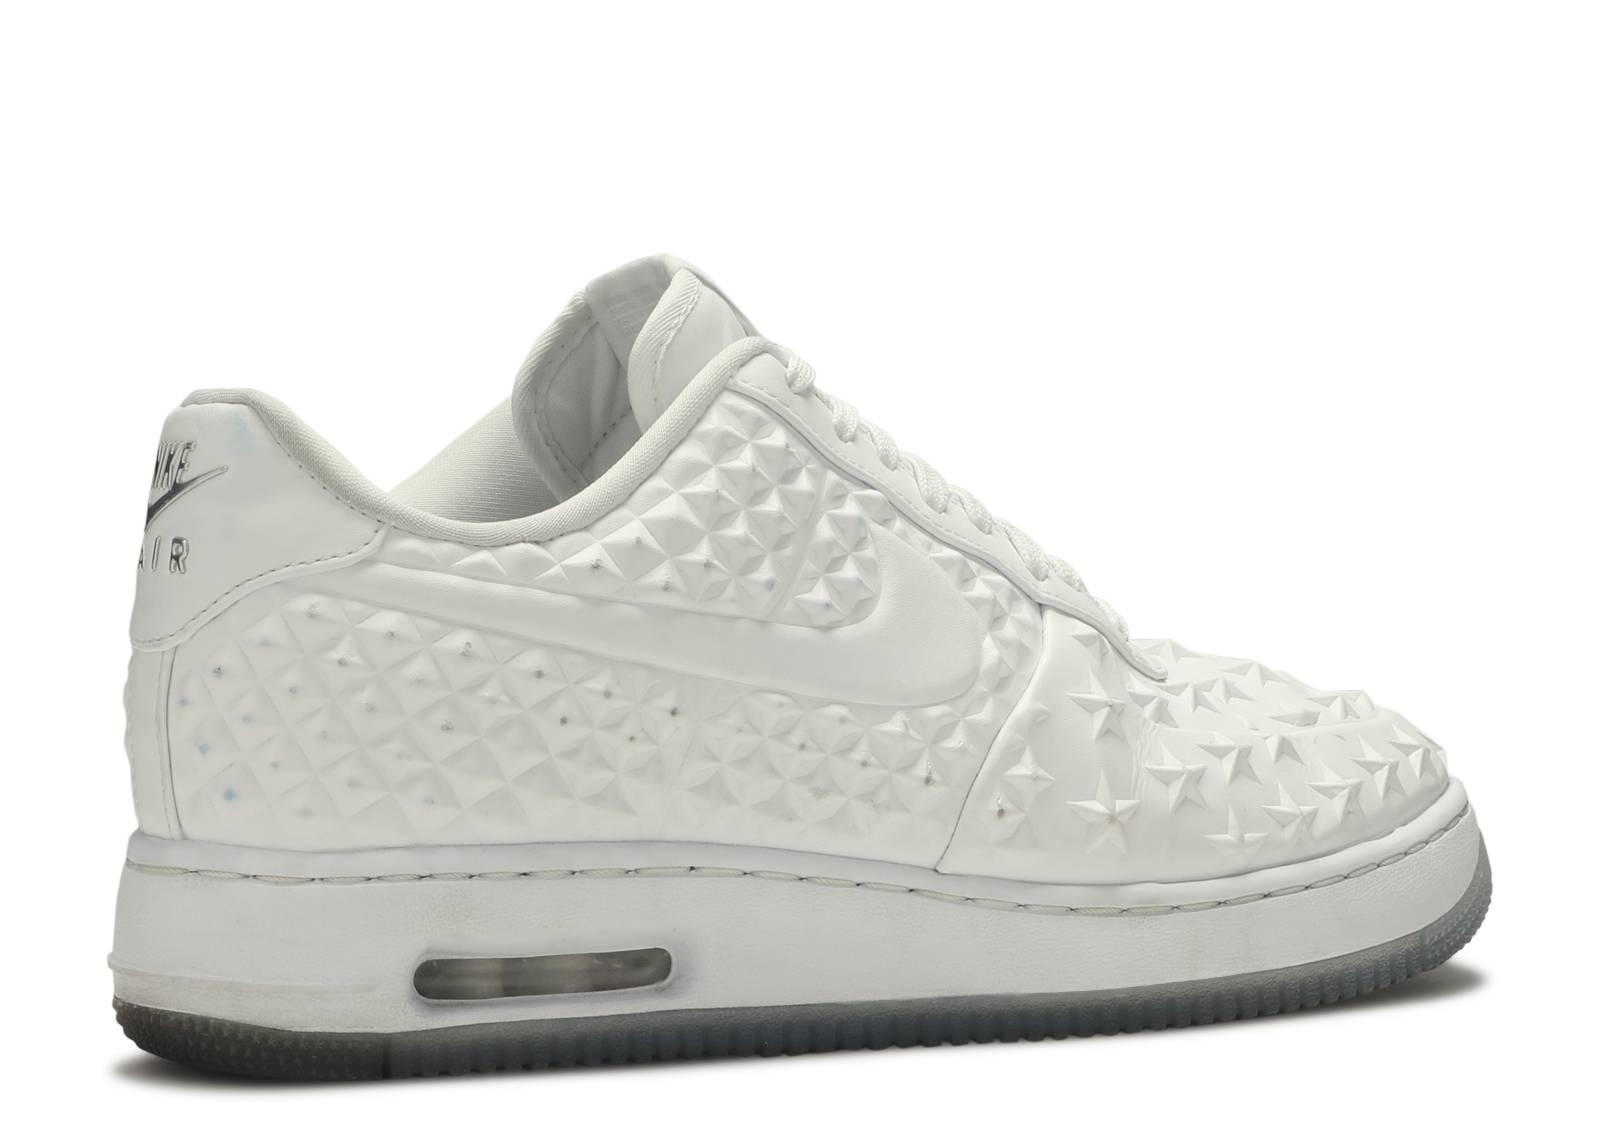 Nike Air Force 1 Élite Acheter Ici Toute Létoile Payer